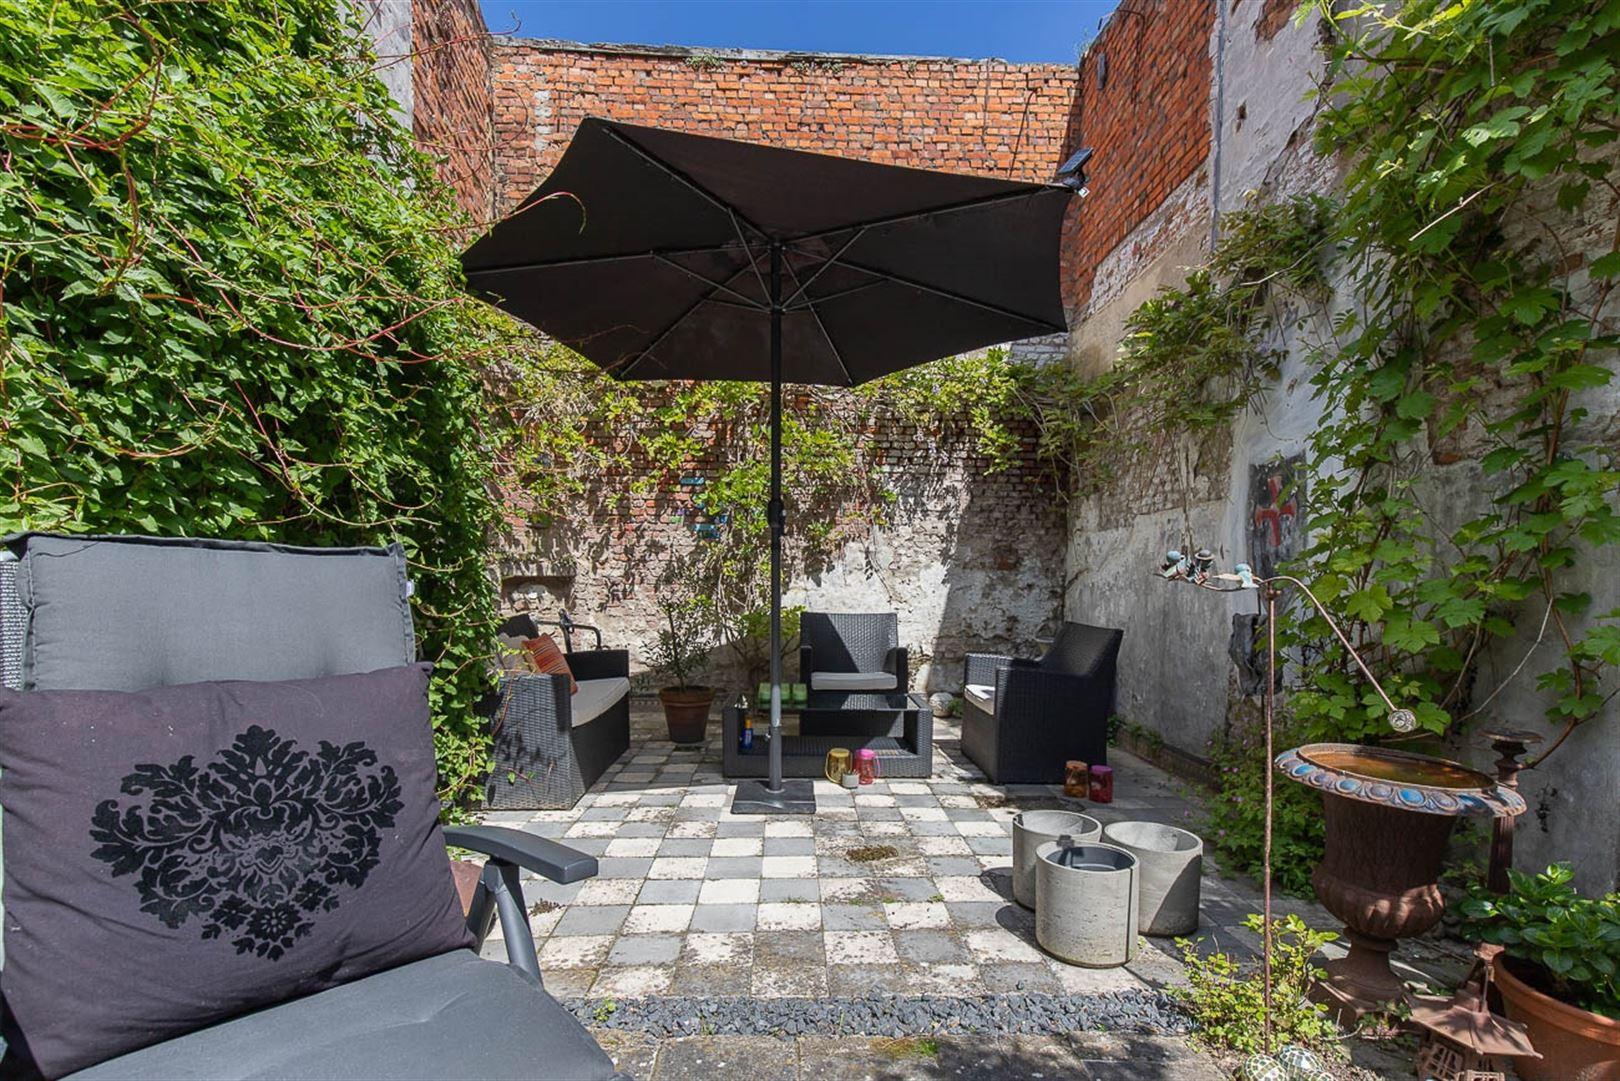 Foto 20 : Duplex/triplex te 9200 DENDERMONDE (België) - Prijs € 495.000